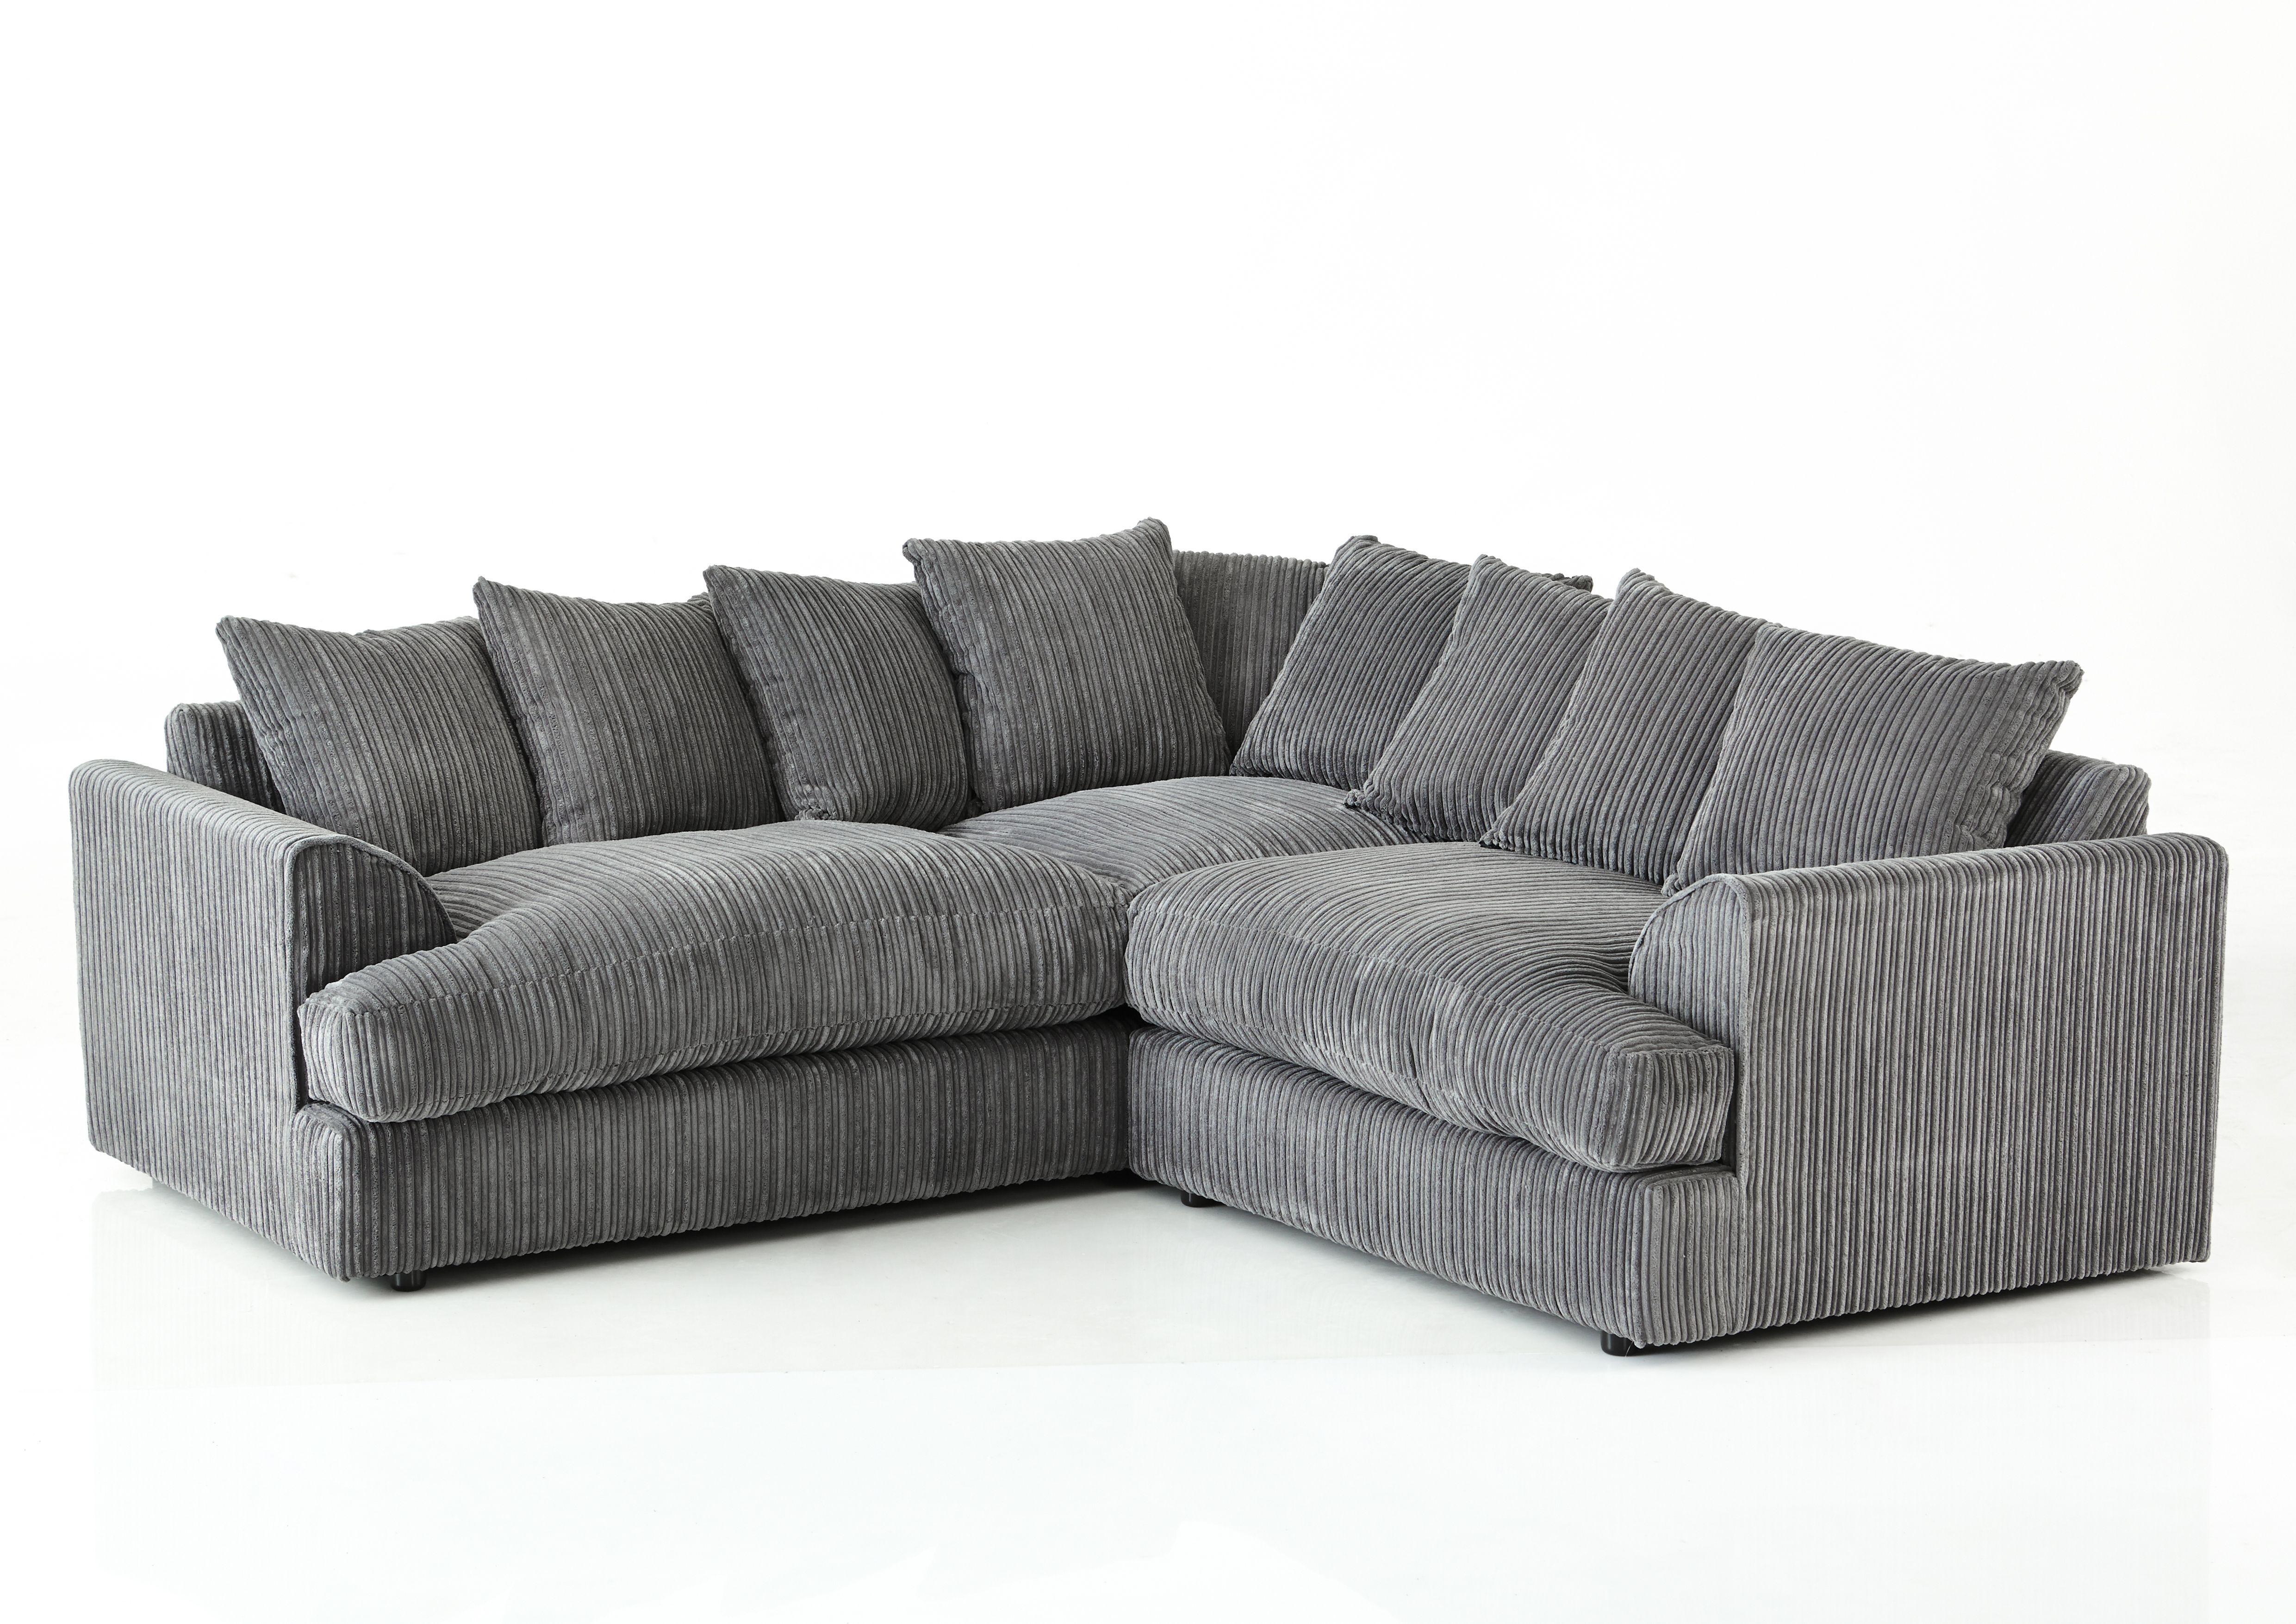 Fabric Sofas Sofa Styles Grey Corner Sofa Modular Corner Sofa Corner Sofa